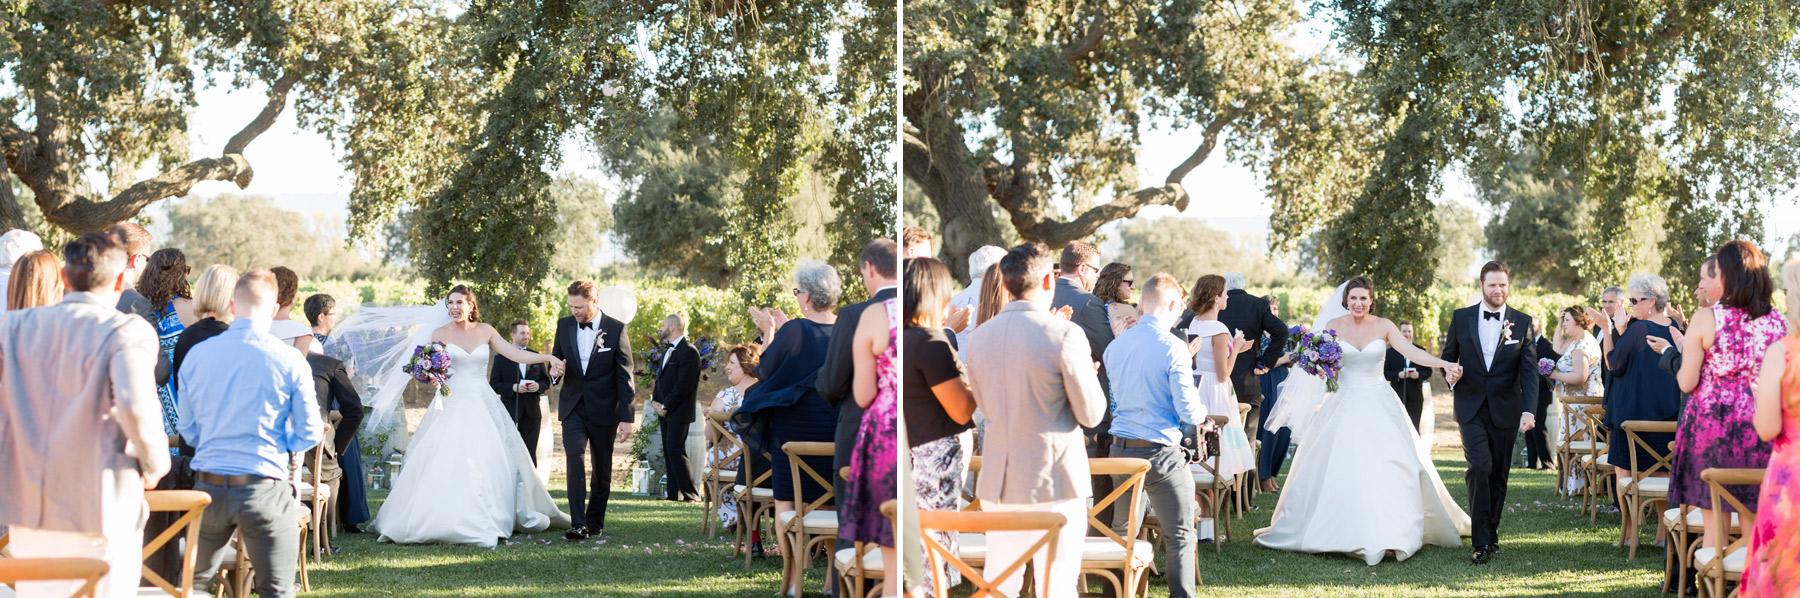 nygifta brollop kalifornien